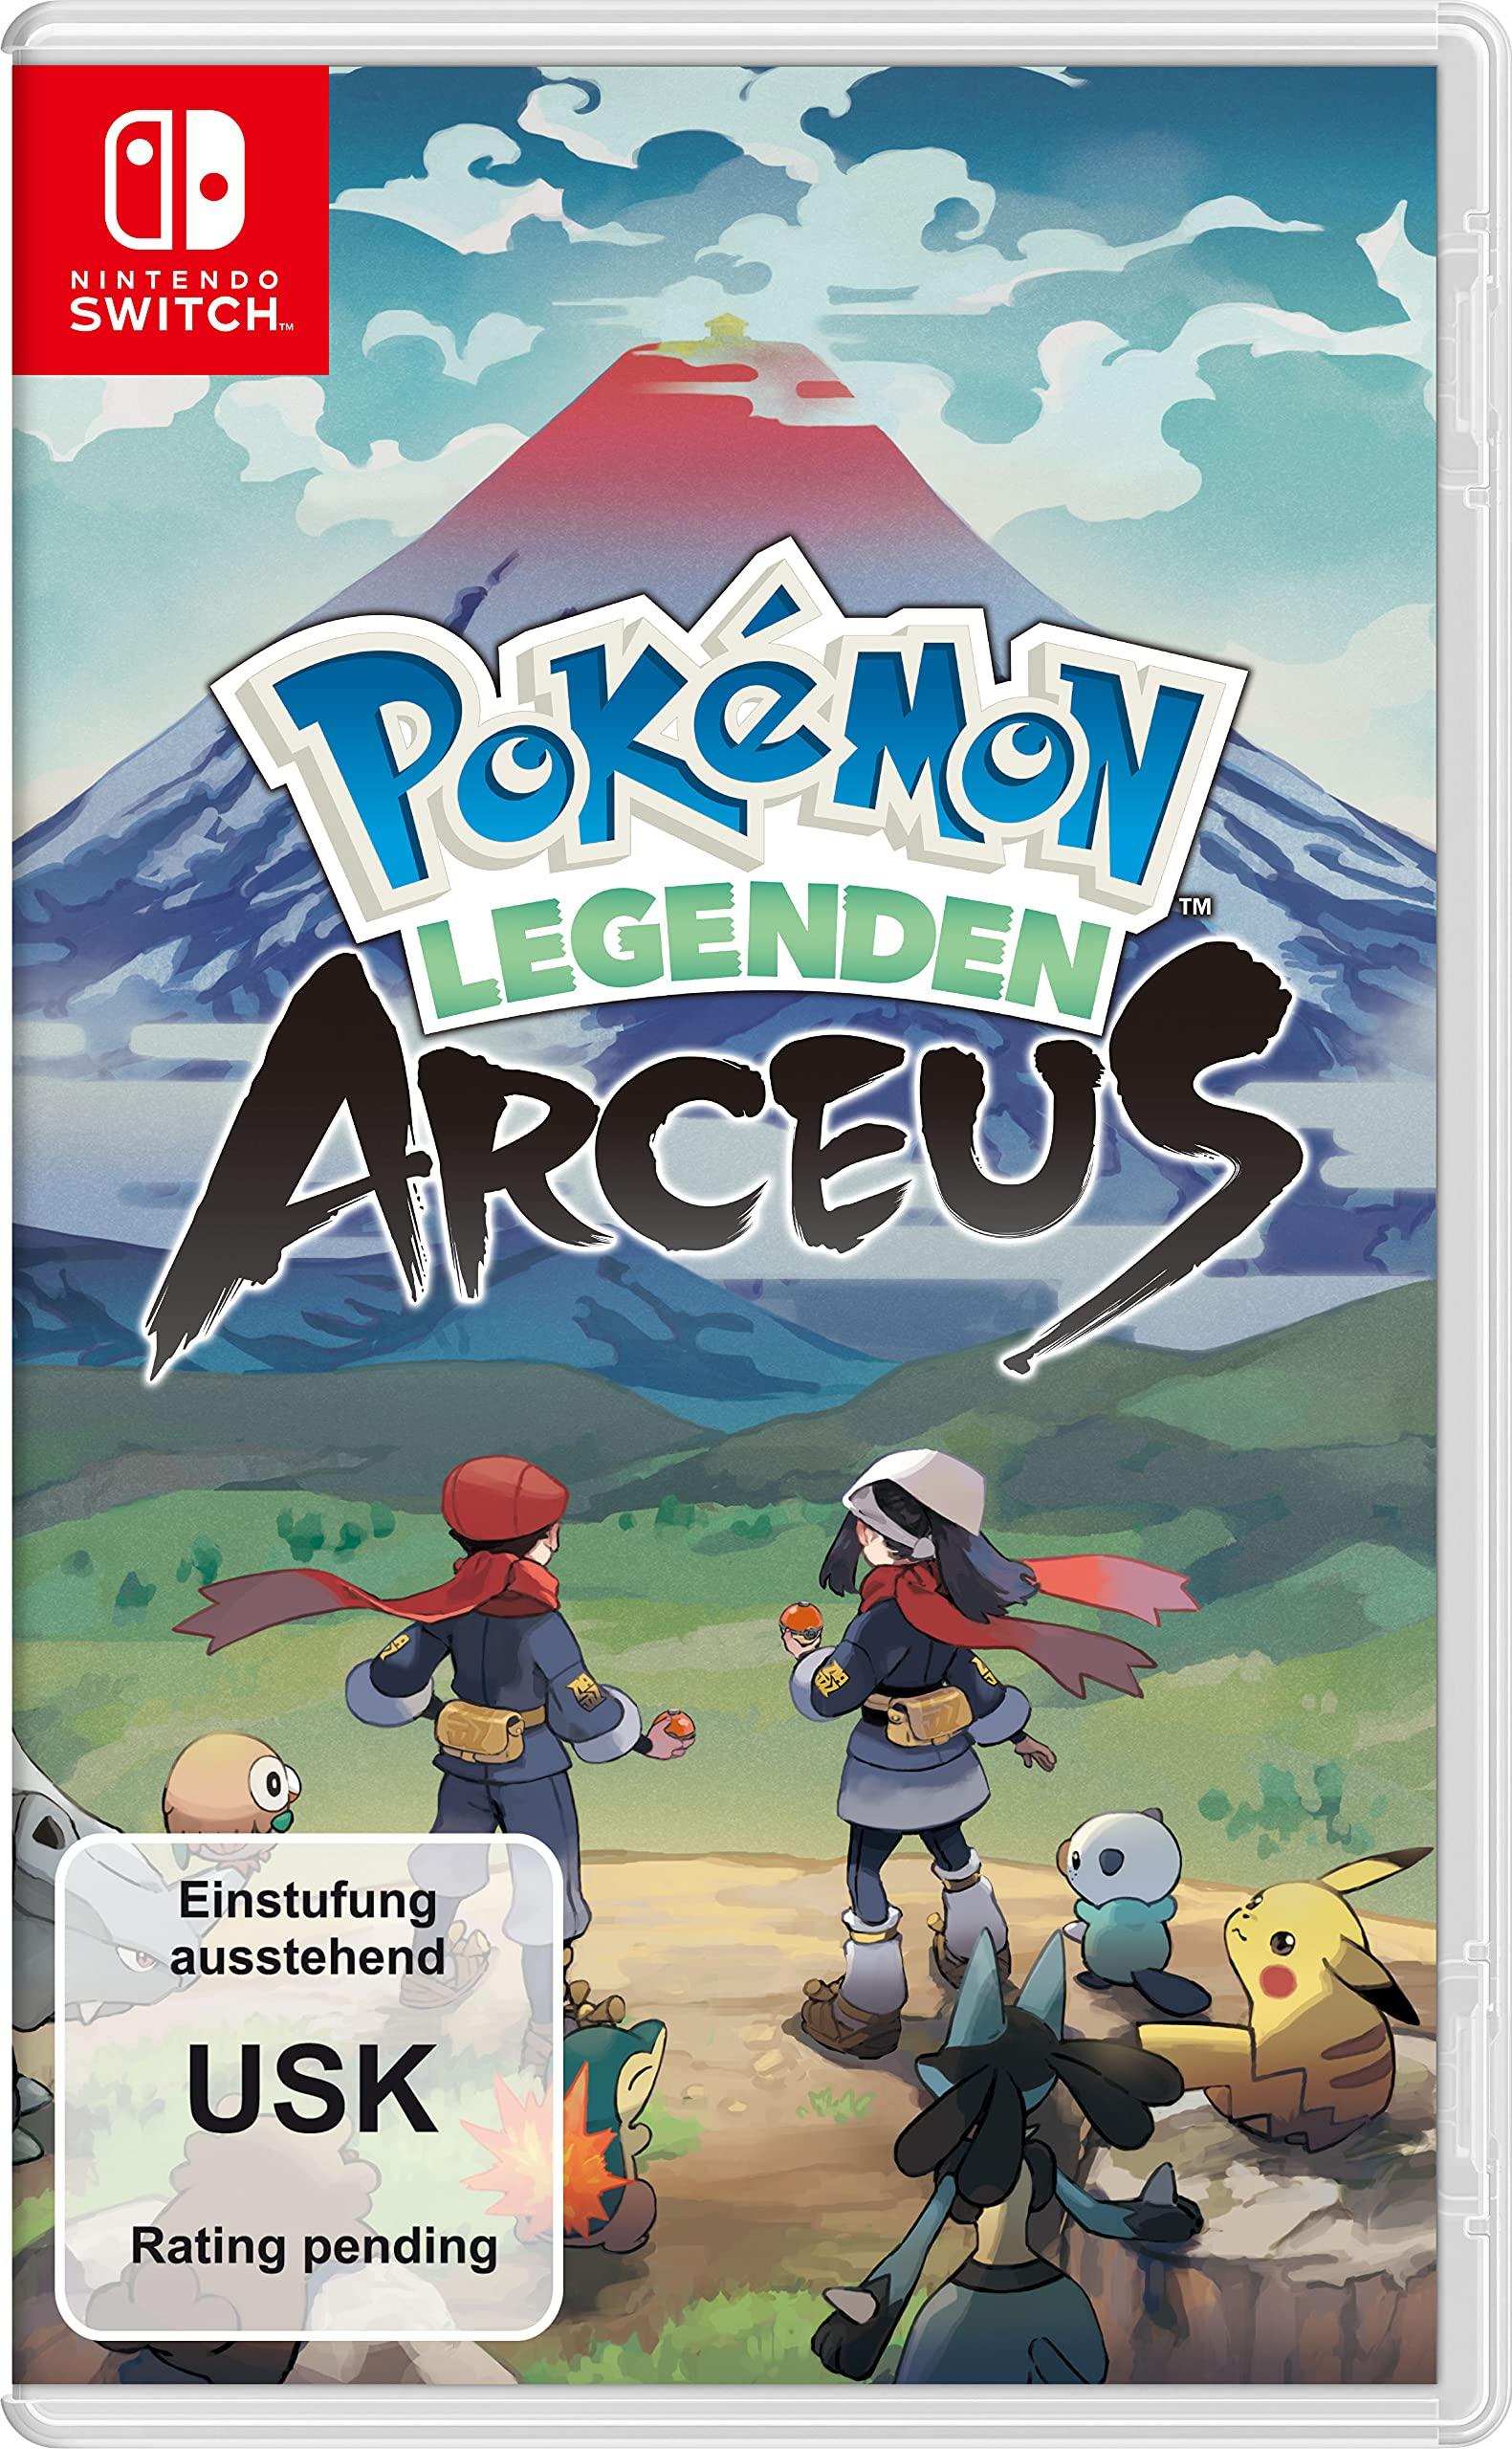 PokémonLegenden: Arceus [Nintendo Switch] - Pokemon Legenden Arceus